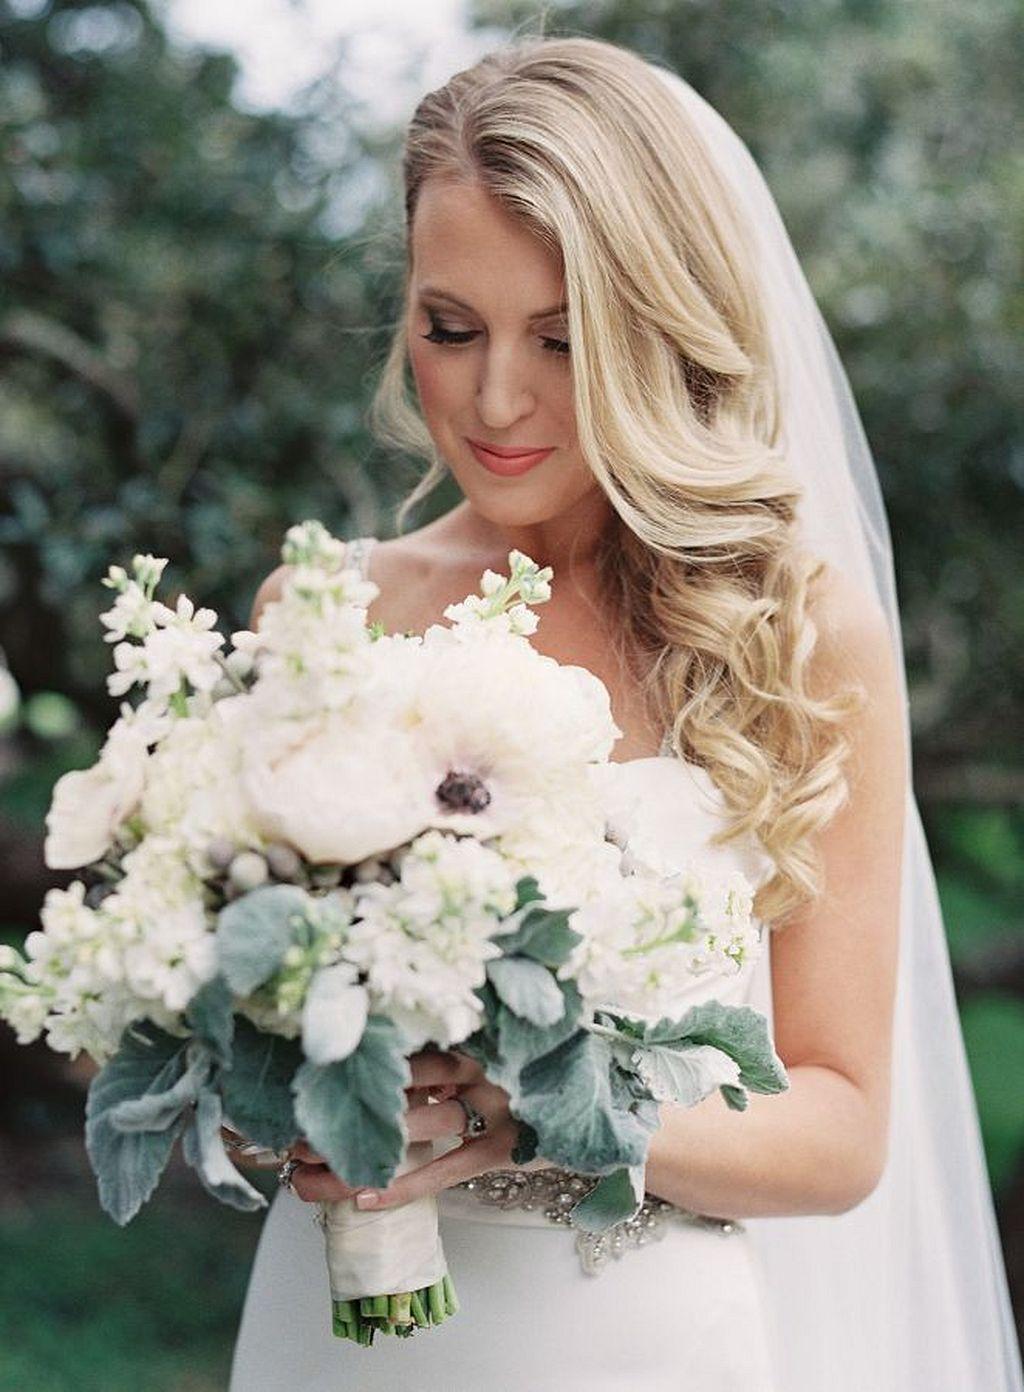 Stunning wedding hair down with veil ideas weddmagz